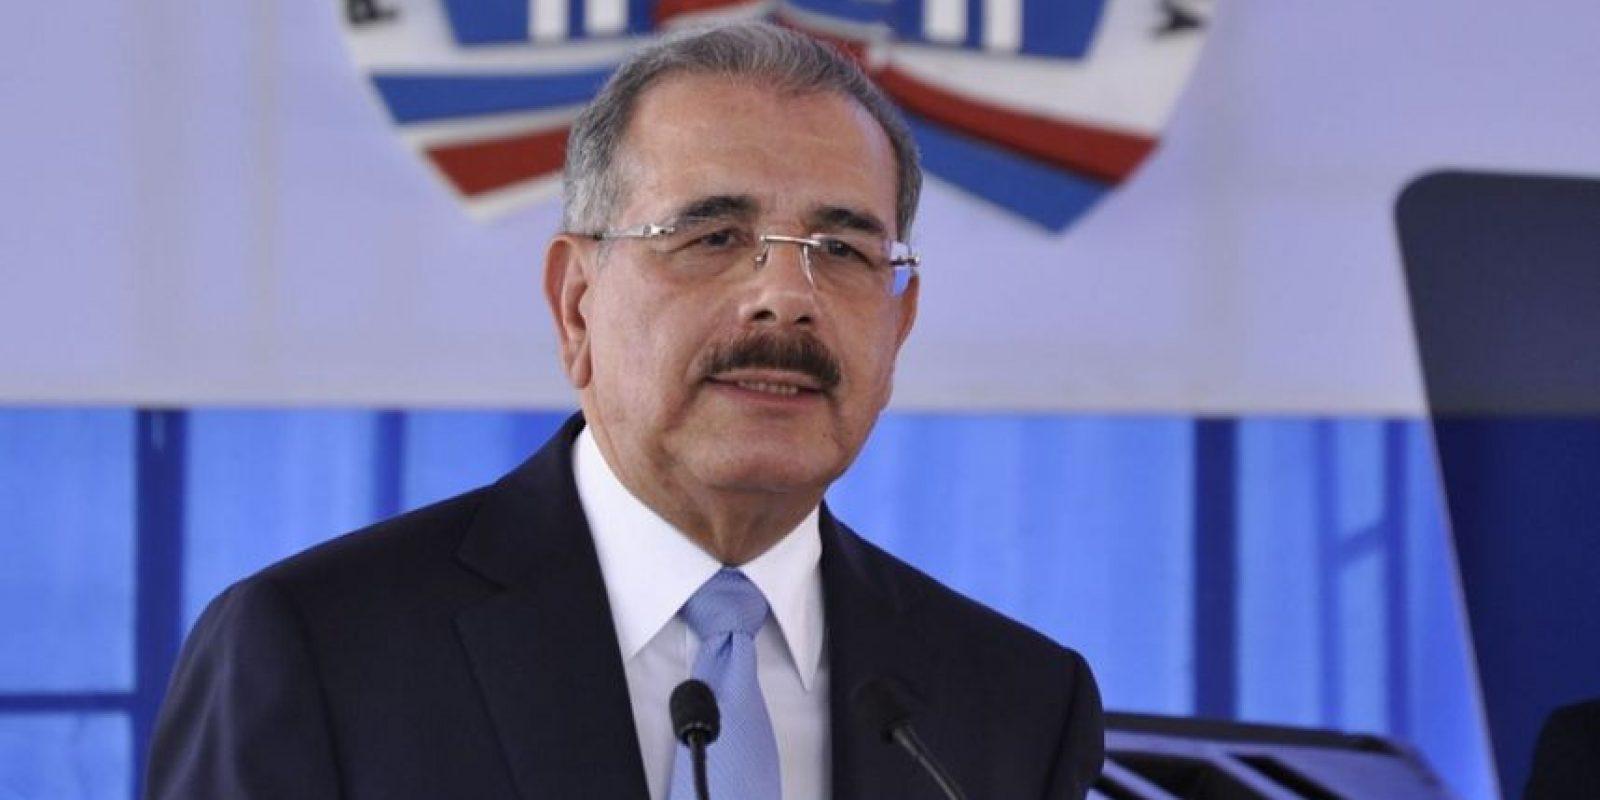 Danilo Medina. Año: 2016